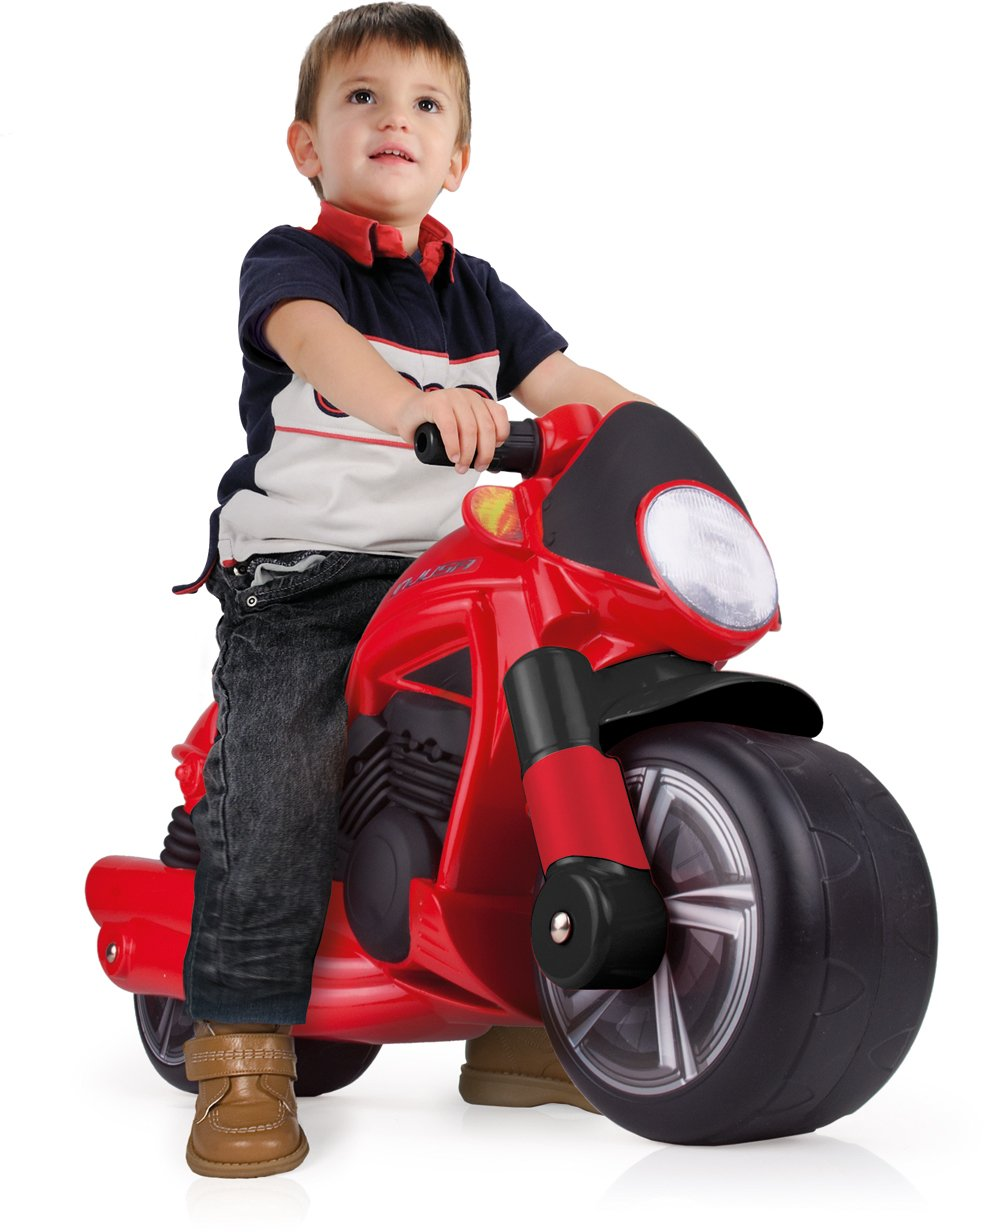 Moto roja compasillos con niño width=